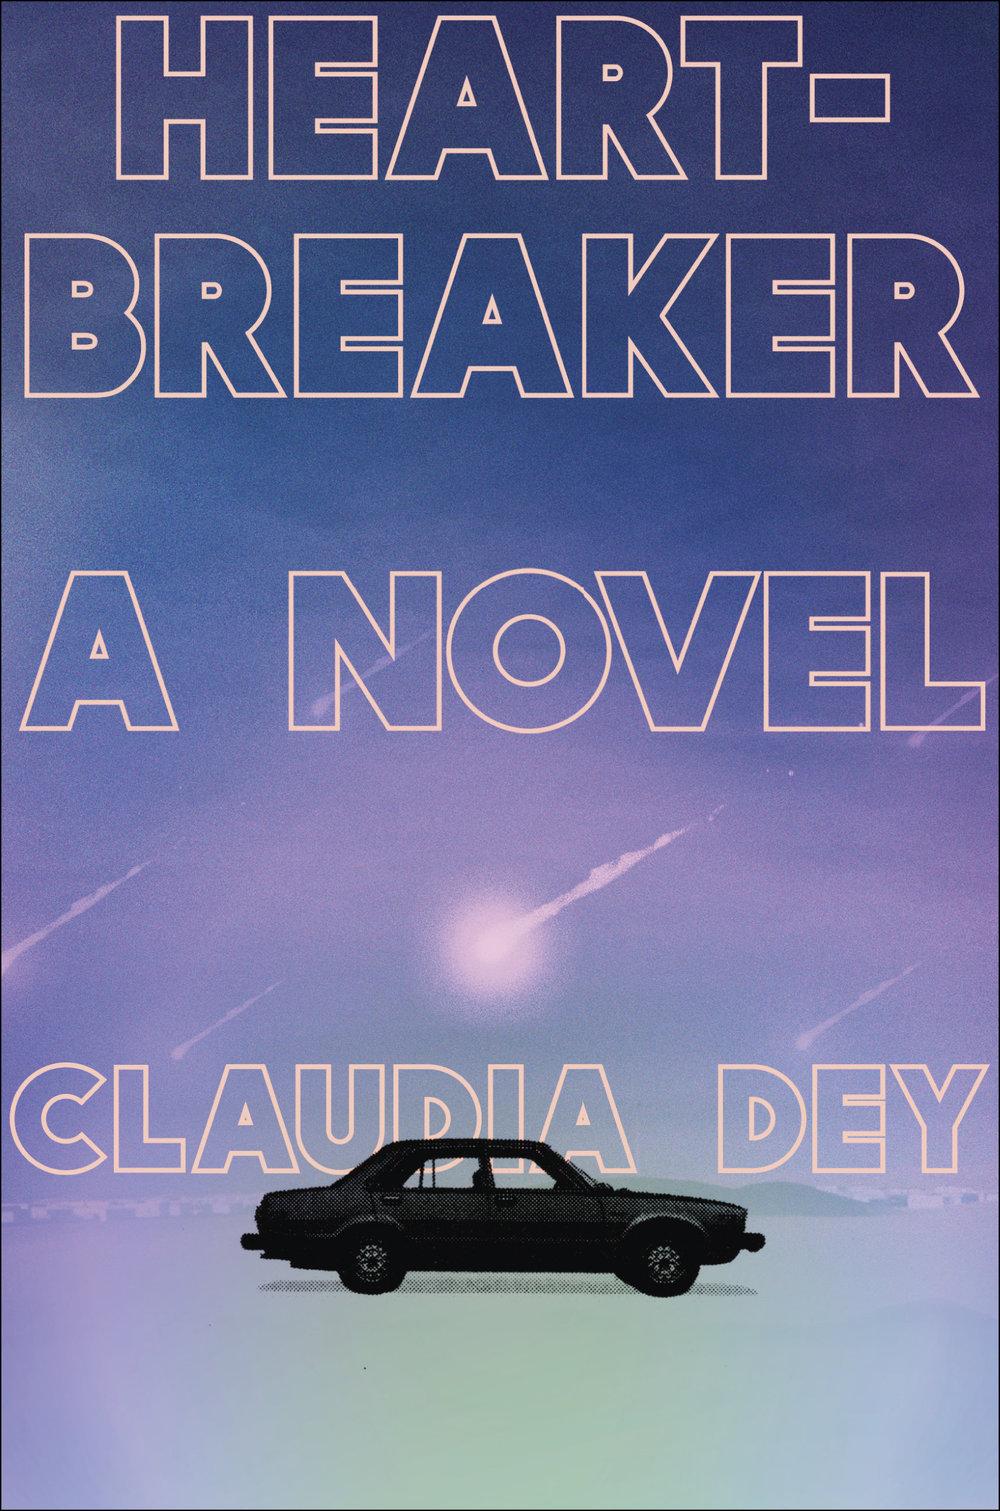 Dey, Claudia - Heartbreaker - US Cover.jpg